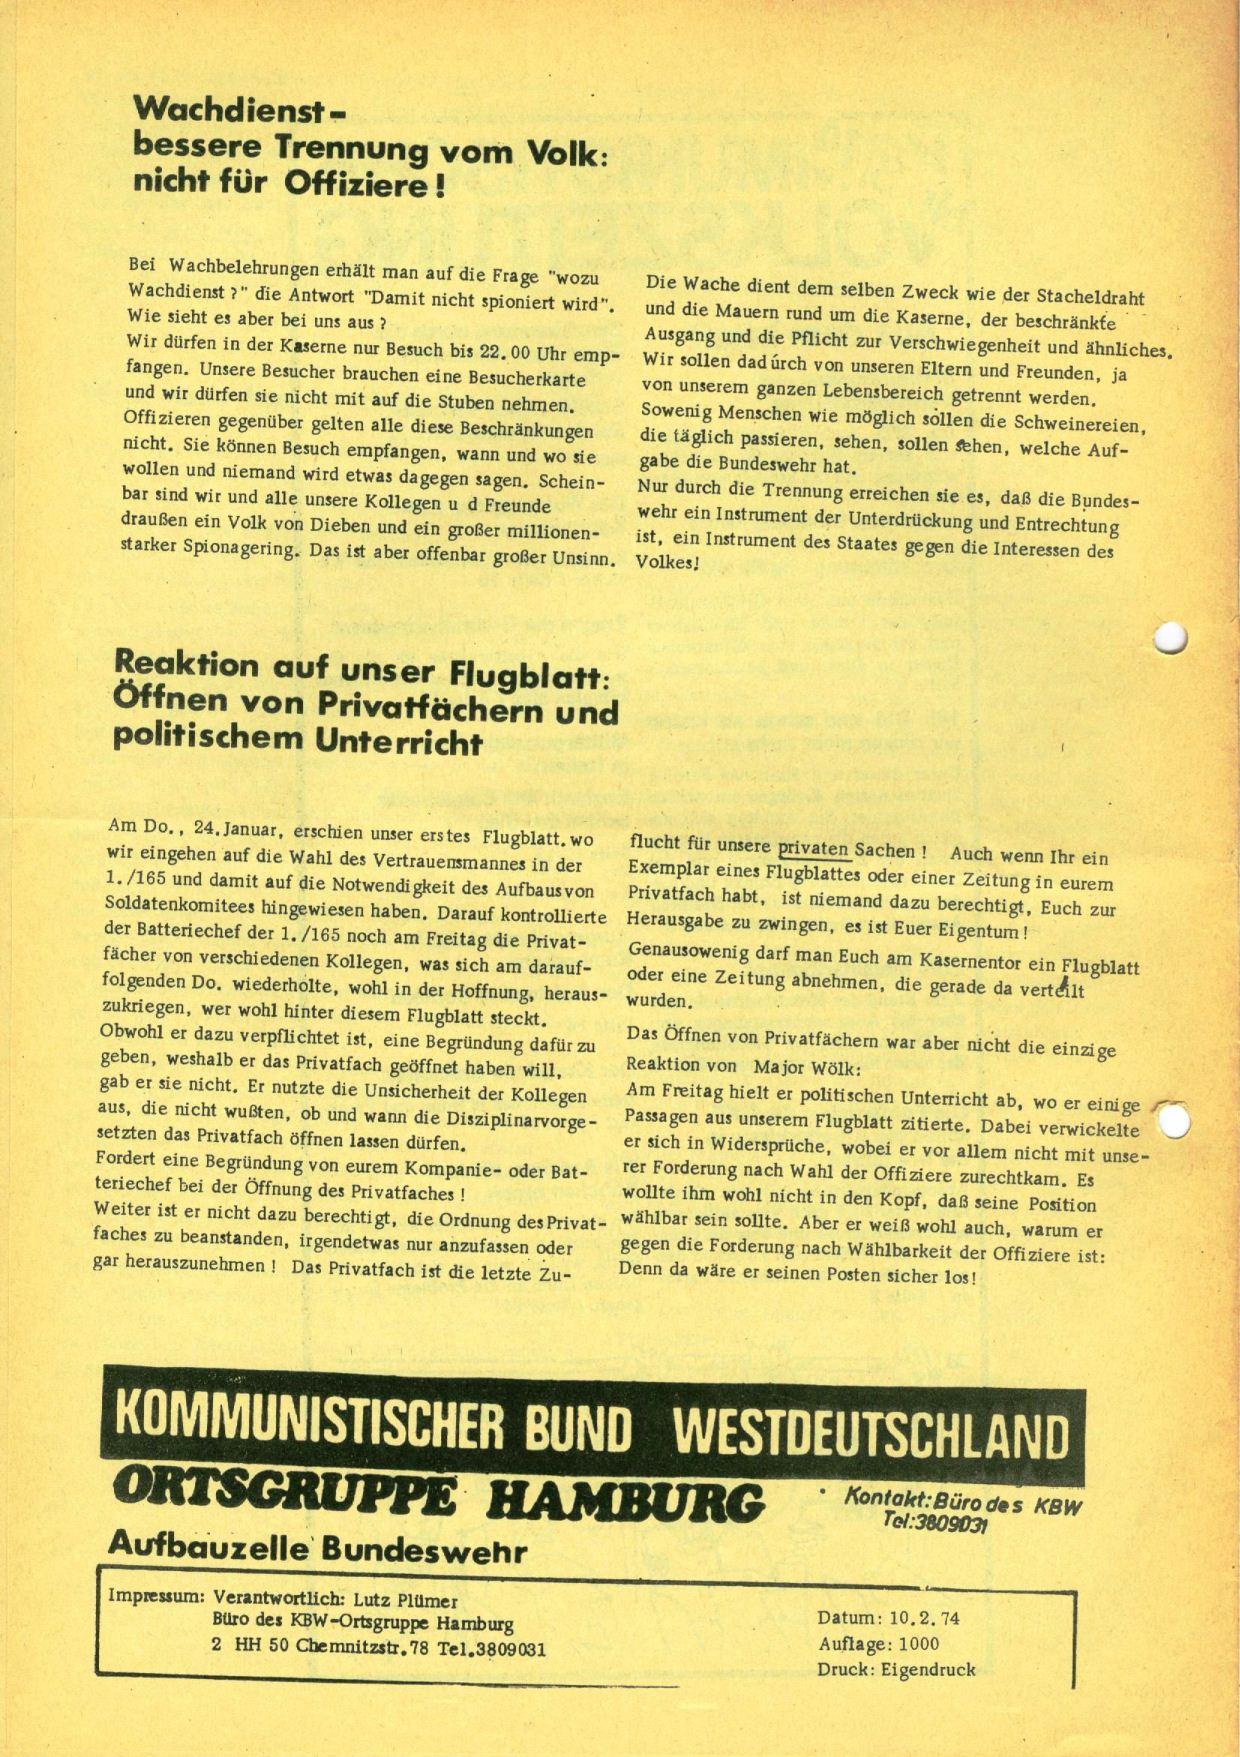 Hamburg_SRK020